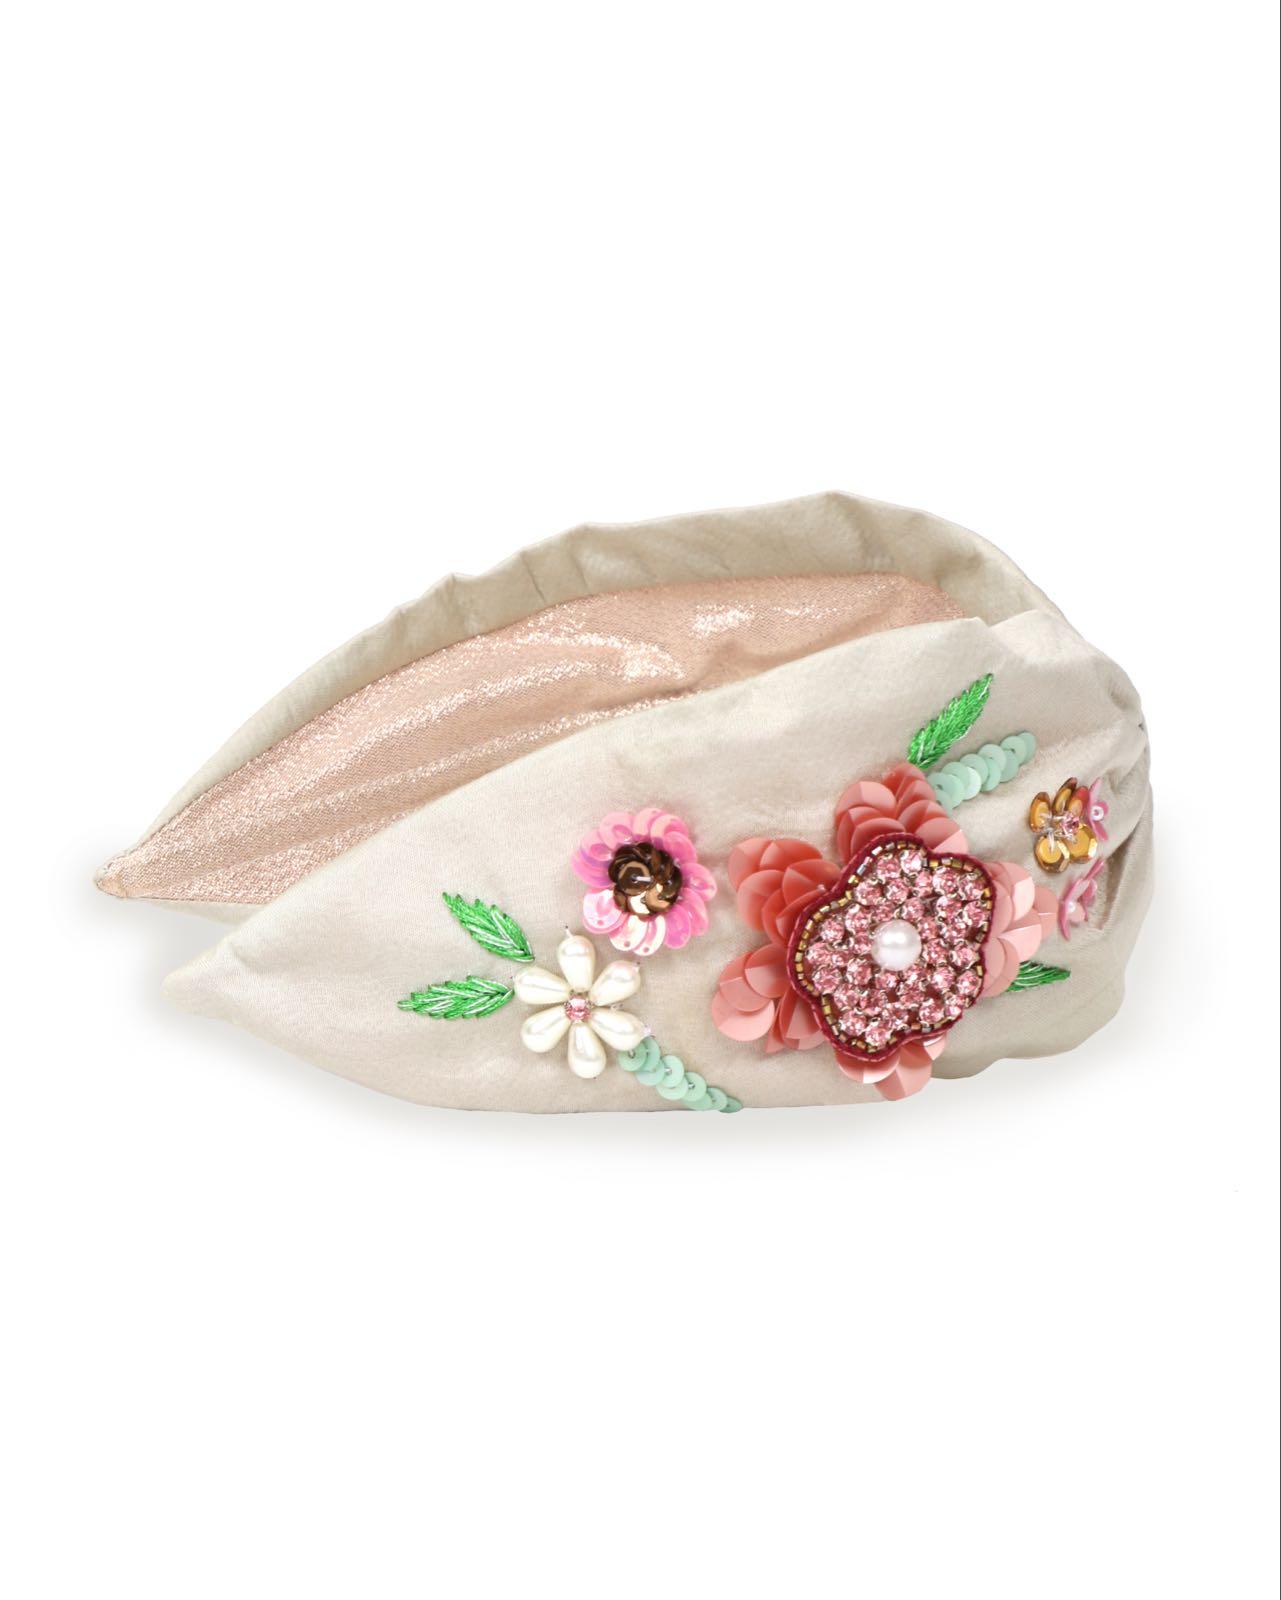 Powder champagne floral headband